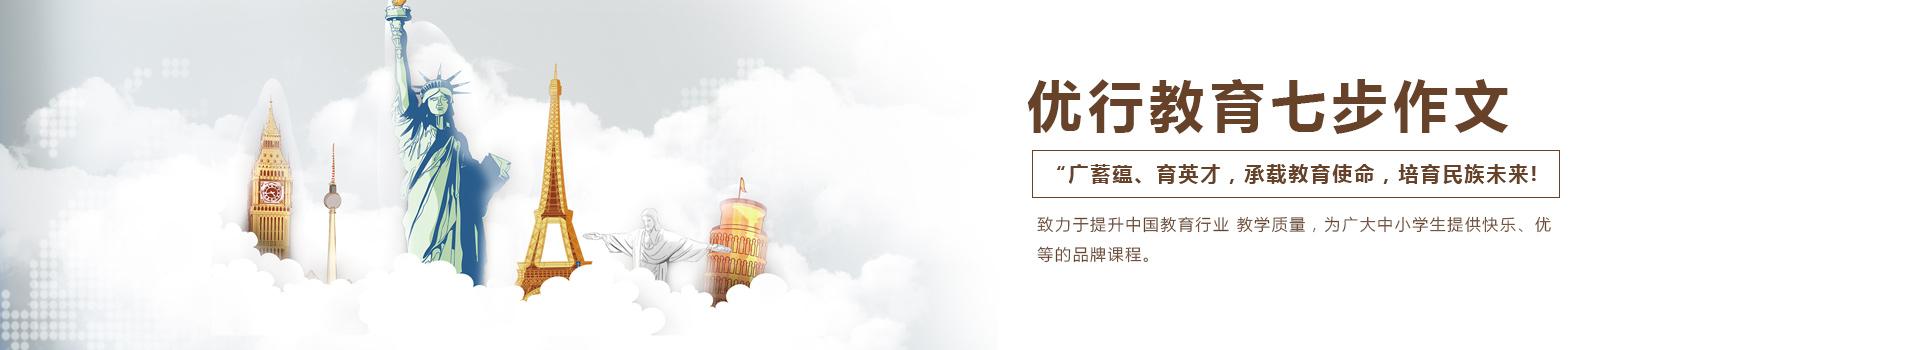 http://www.beisongdanci.com/data/upload/202106/20210629170223_135.jpg